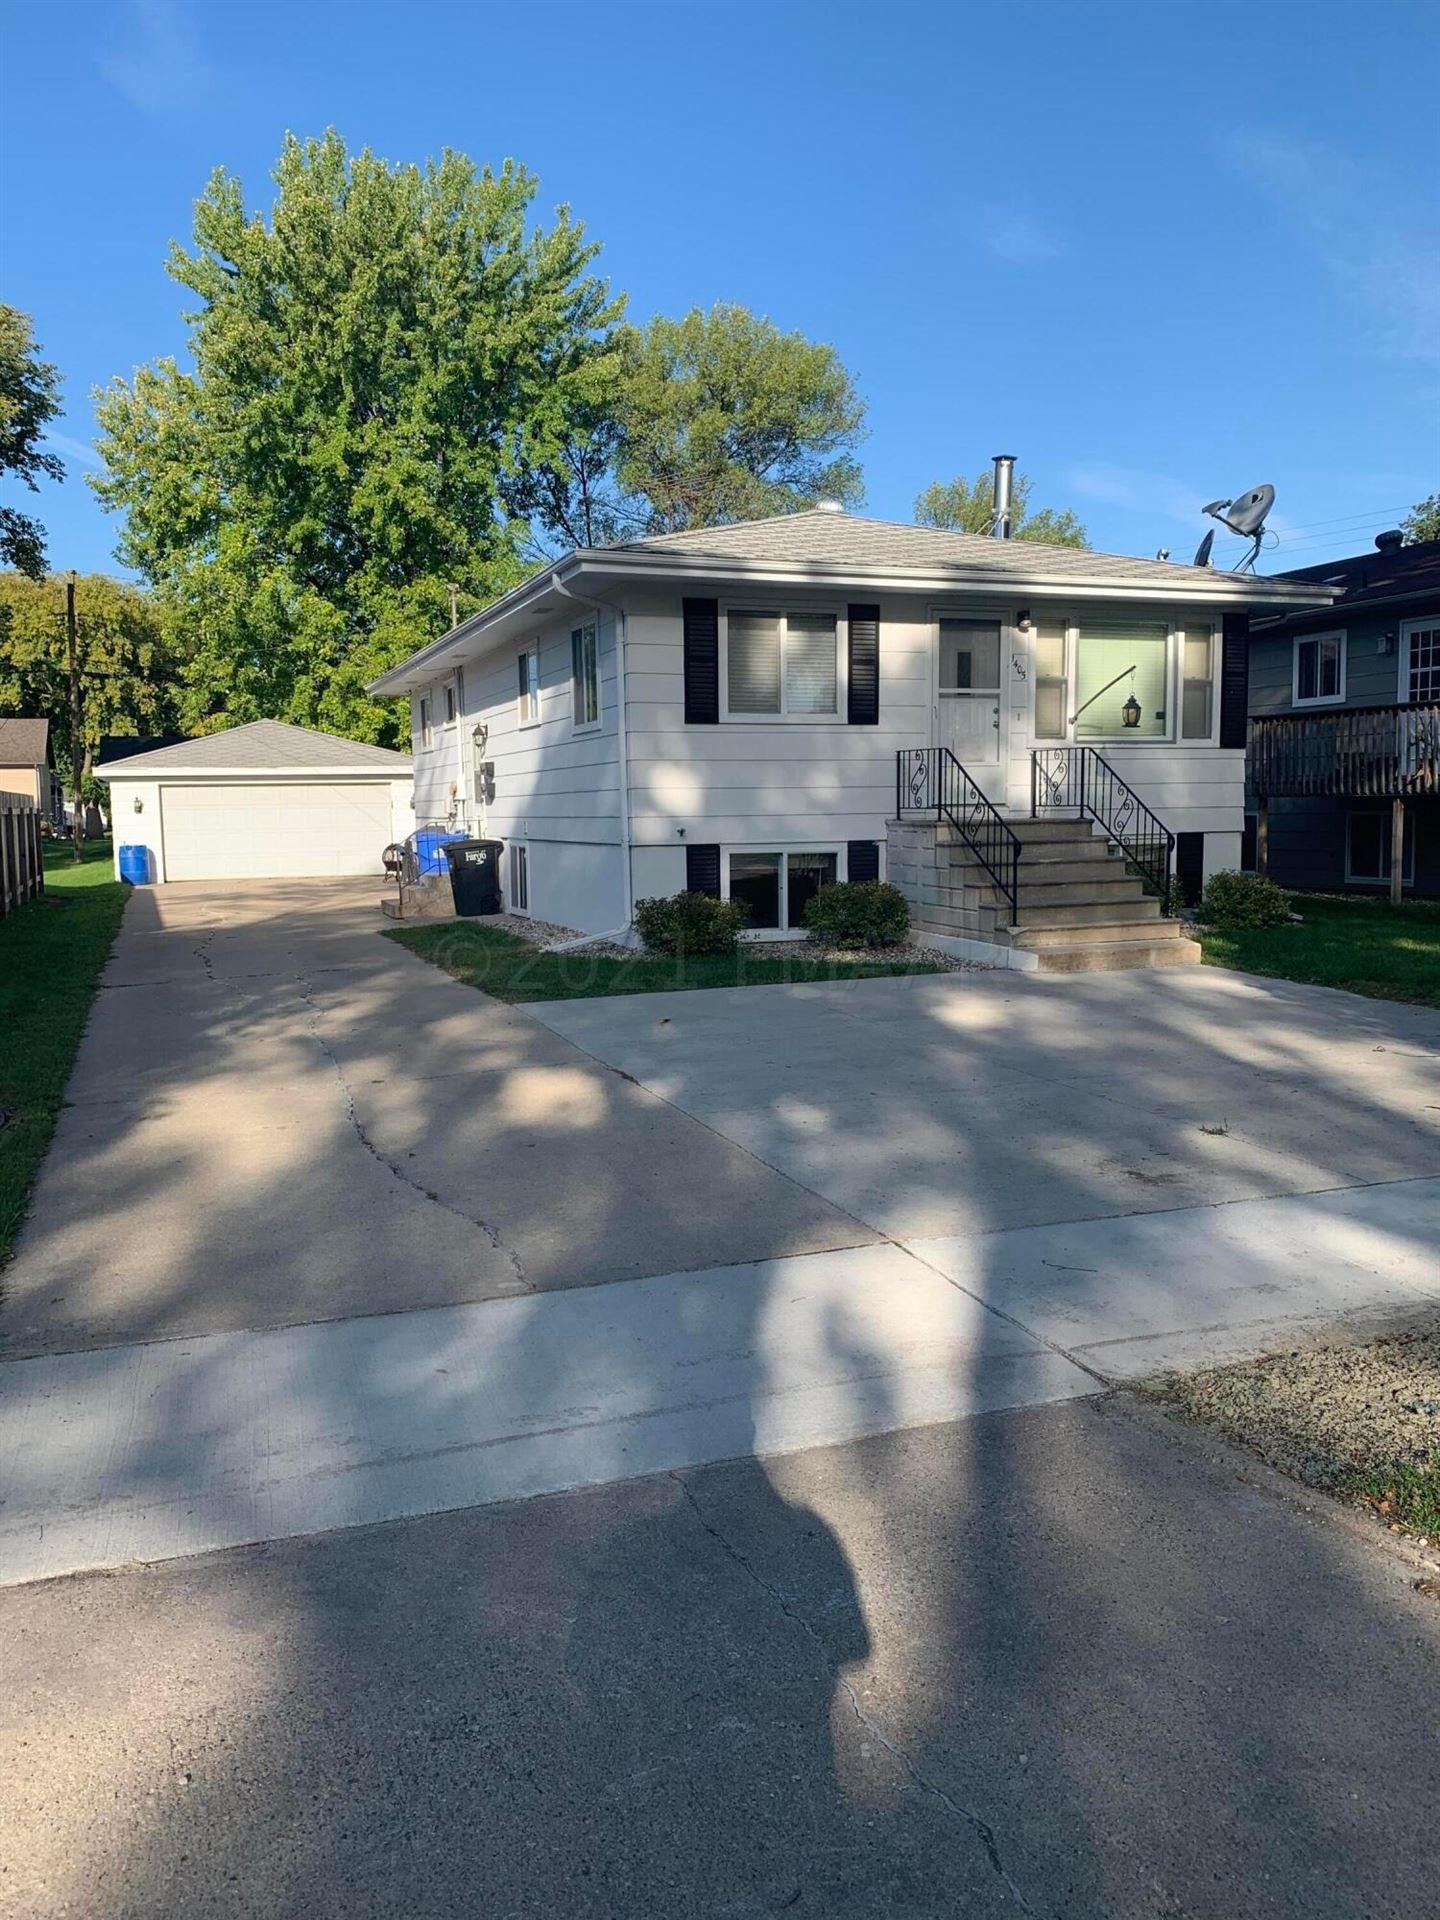 1405 16 Street S, Fargo, ND 58102 - #: 21-4442